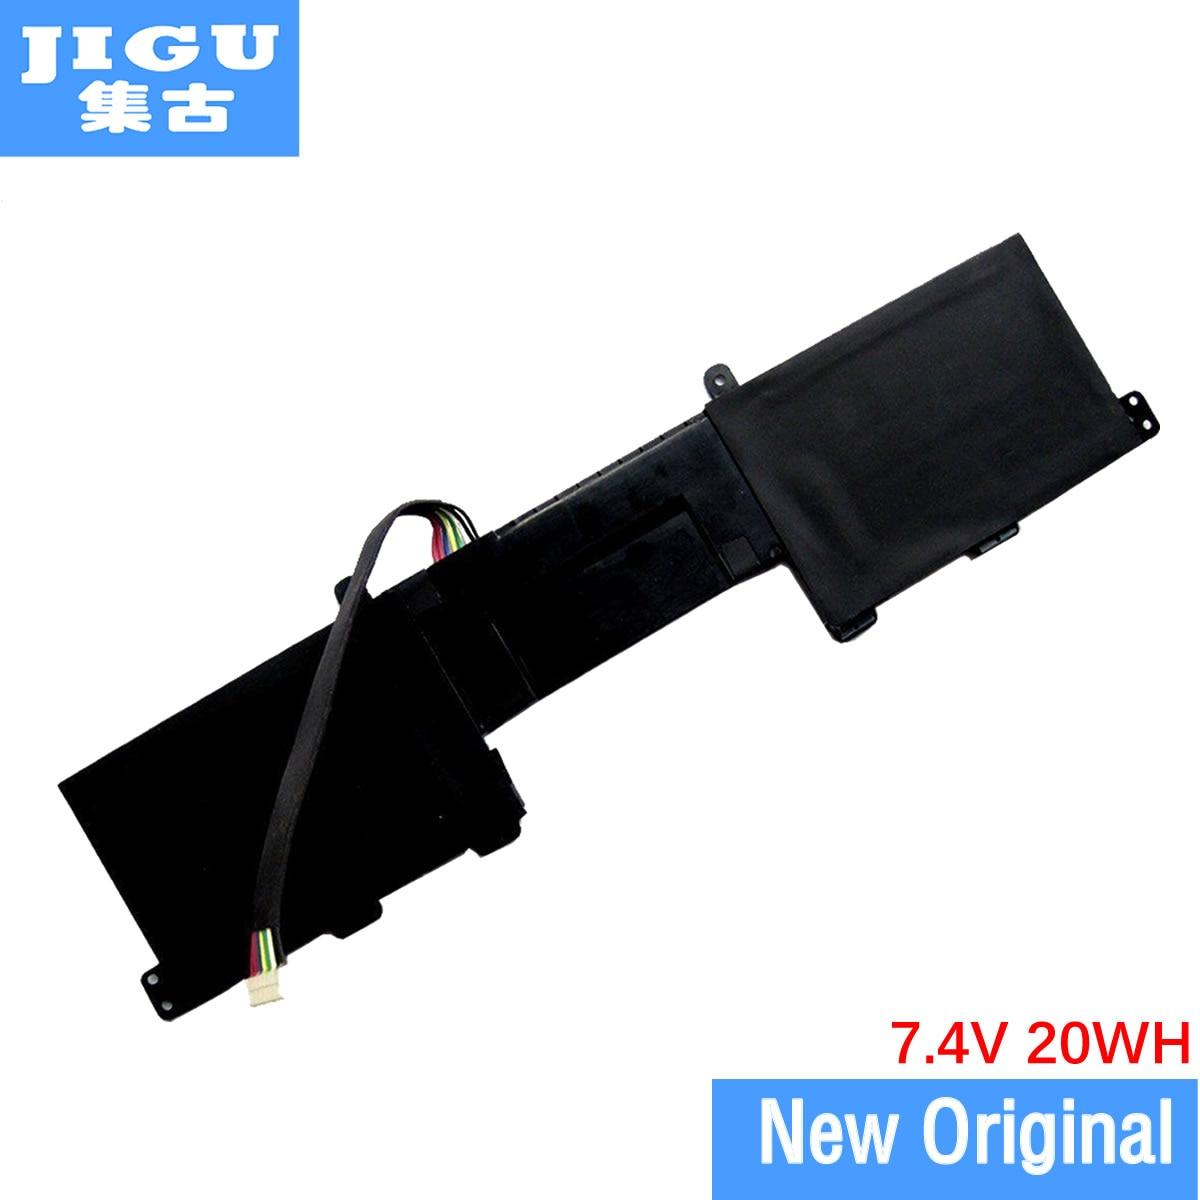 JIGU-بطارية كمبيوتر محمول أصلية 0FRVYX TM9HP FRVYX ، لجهاز DELL Latitude 13 7350 7.4V 20WH